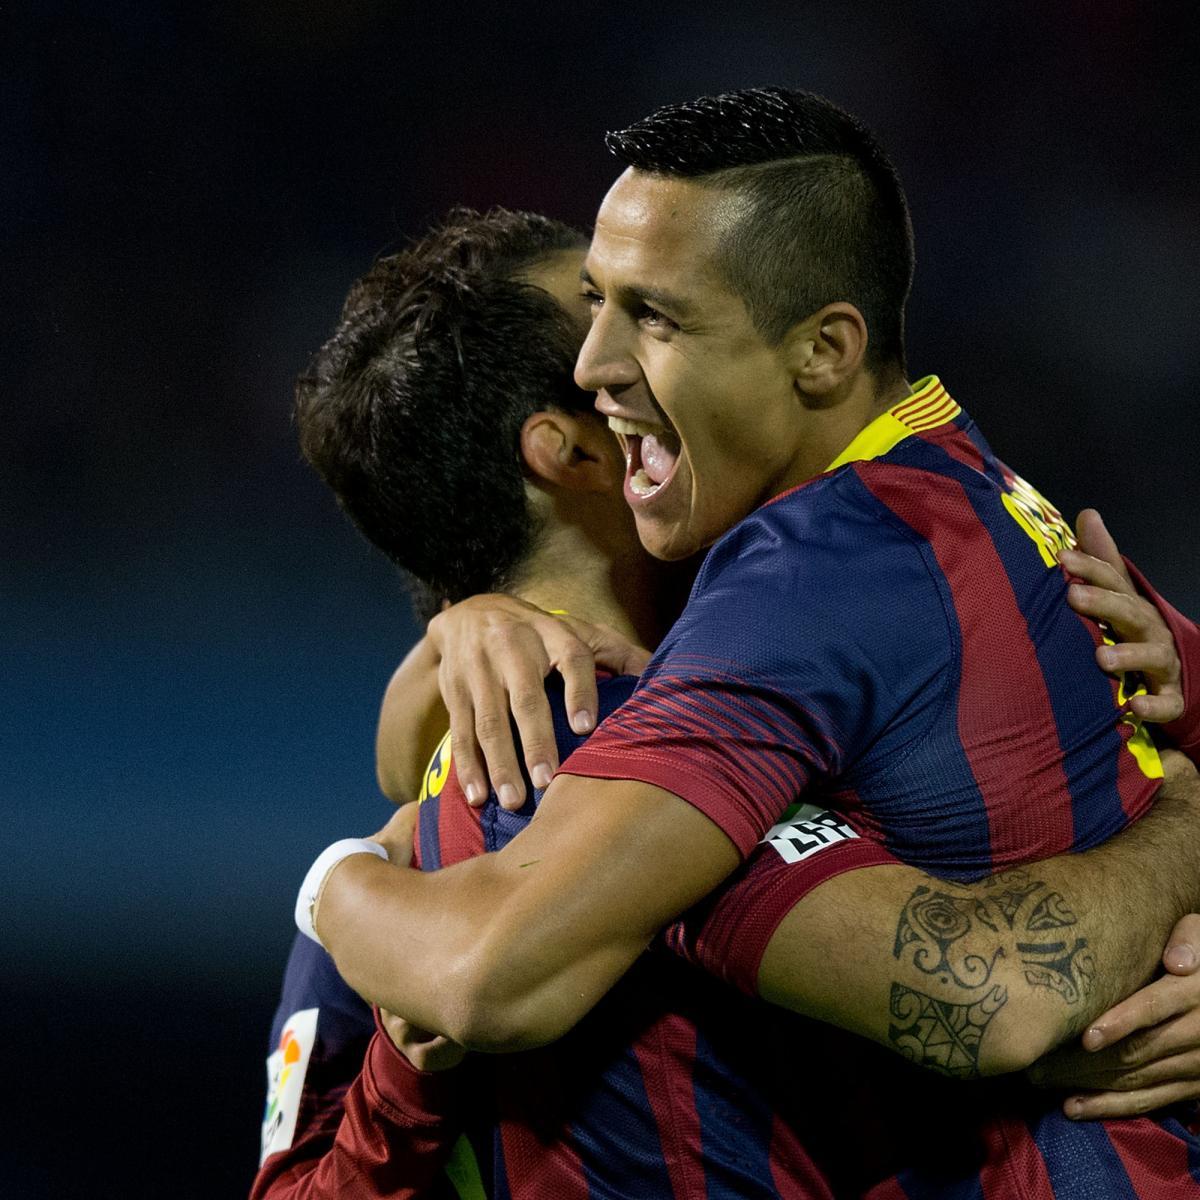 Celta Vigo Vs Barcelona Pred: Celta Vigo Vs. Barcelona: Score, Grades And Post-Match